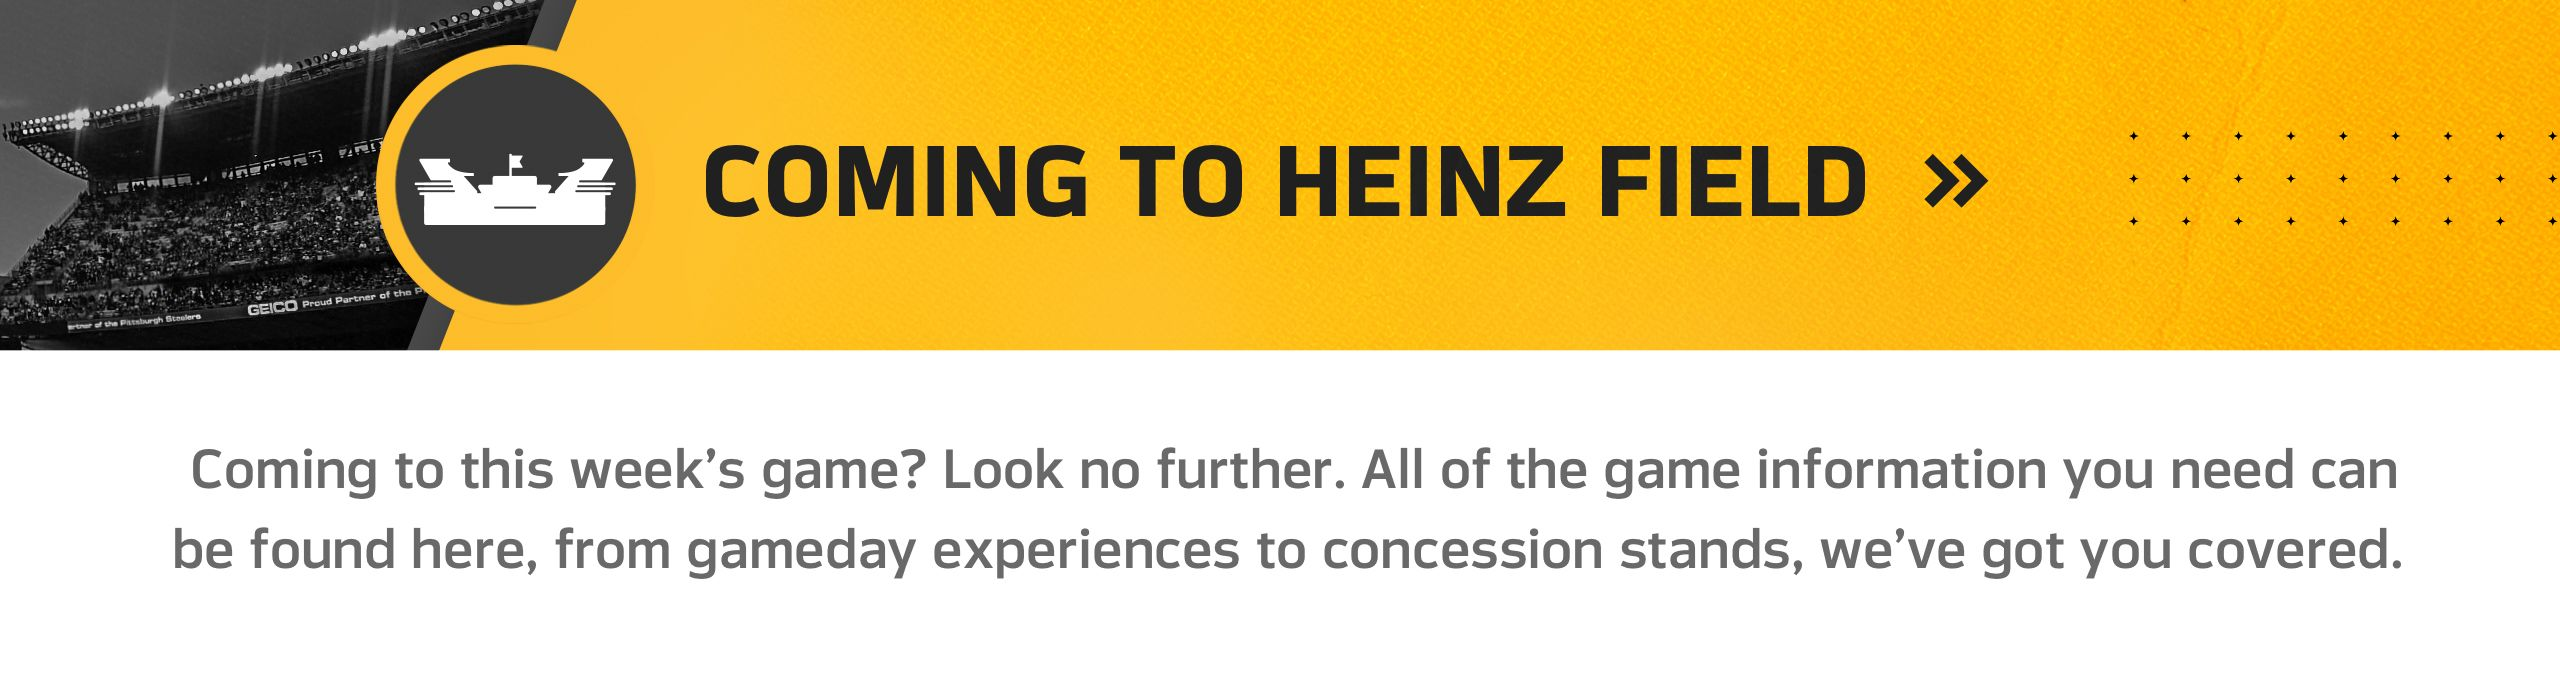 Gameday_HeinzField